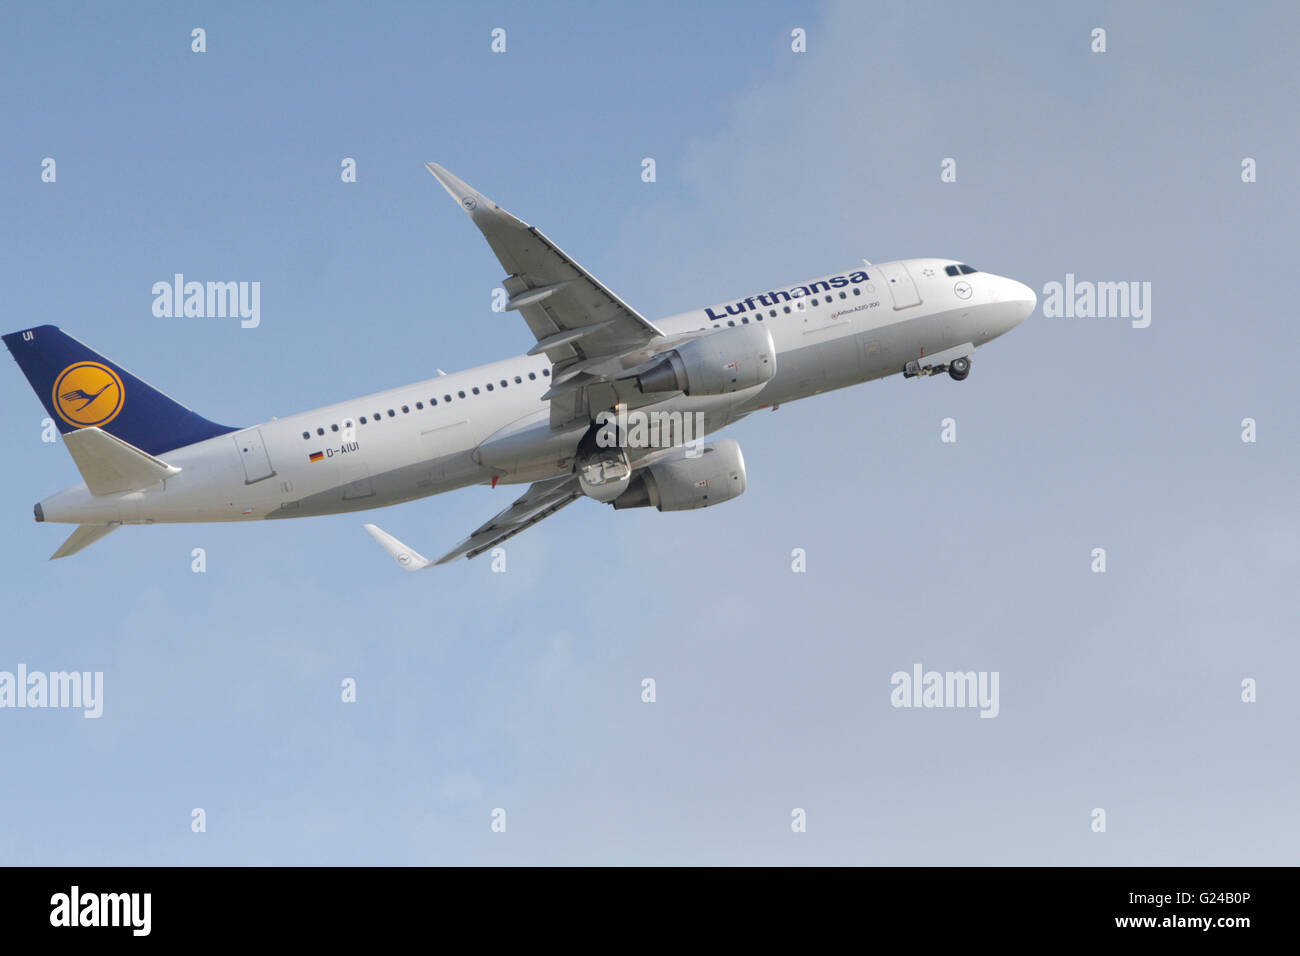 BUCHAREST, ROMANIA - May 18, 2016: German airline Lufthansa, Airbus A320-200, taking off at Henri Coanda International - Stock Image